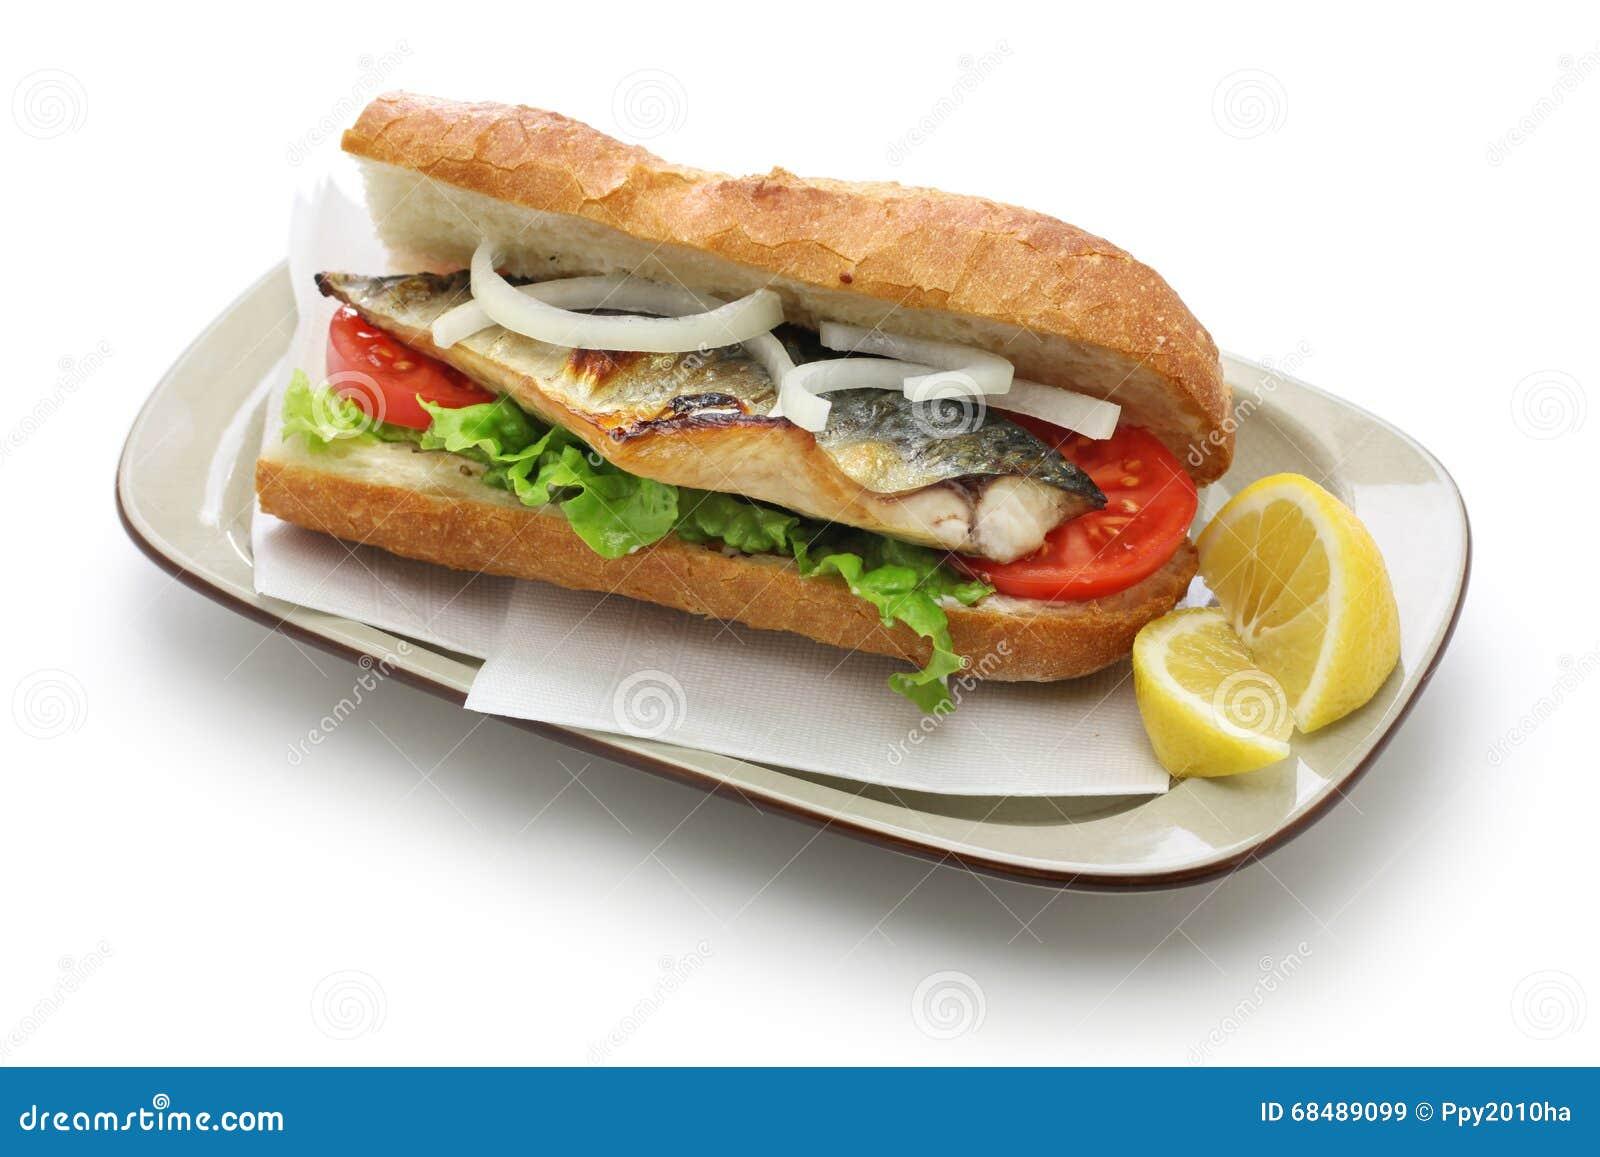 Mackerel fish sandwich, balik ekmek, turkish food